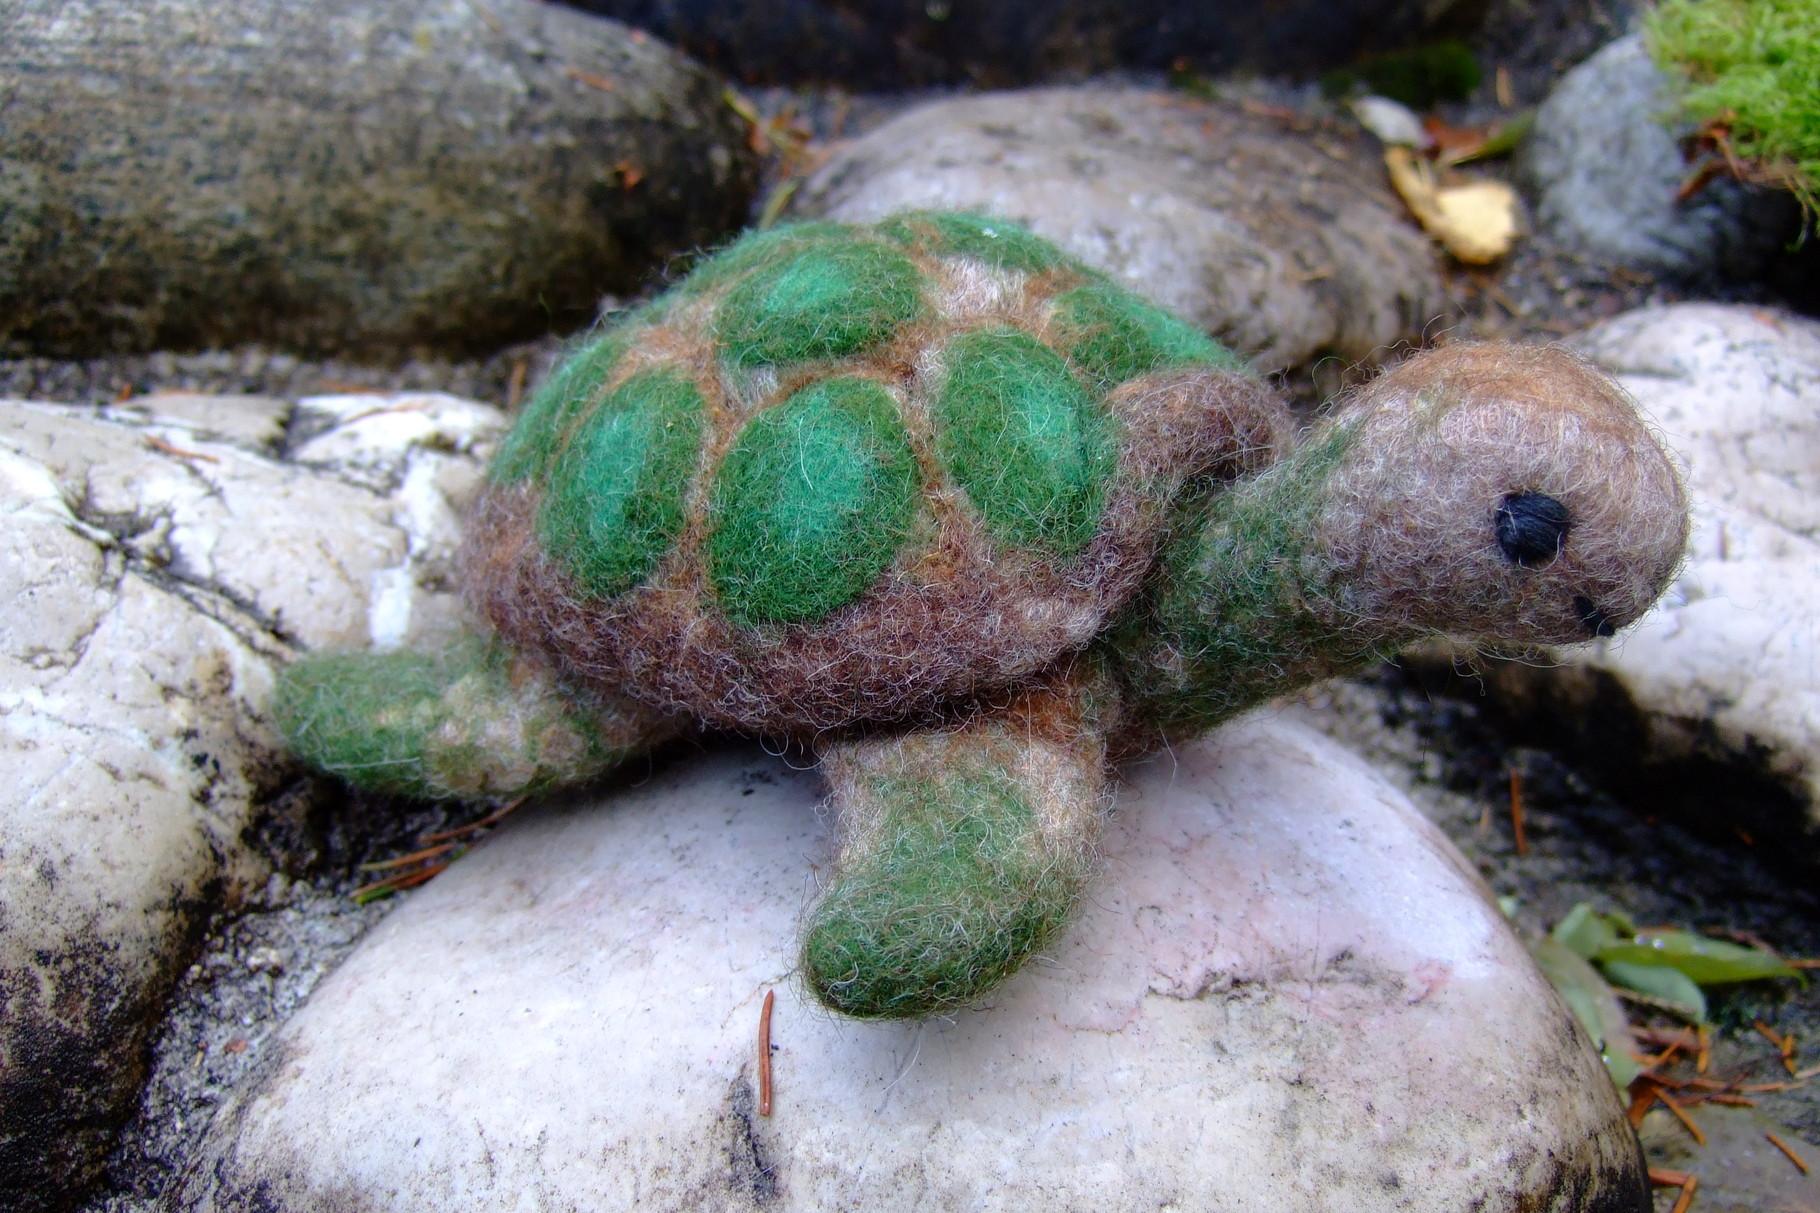 Schildkröte aus Filz